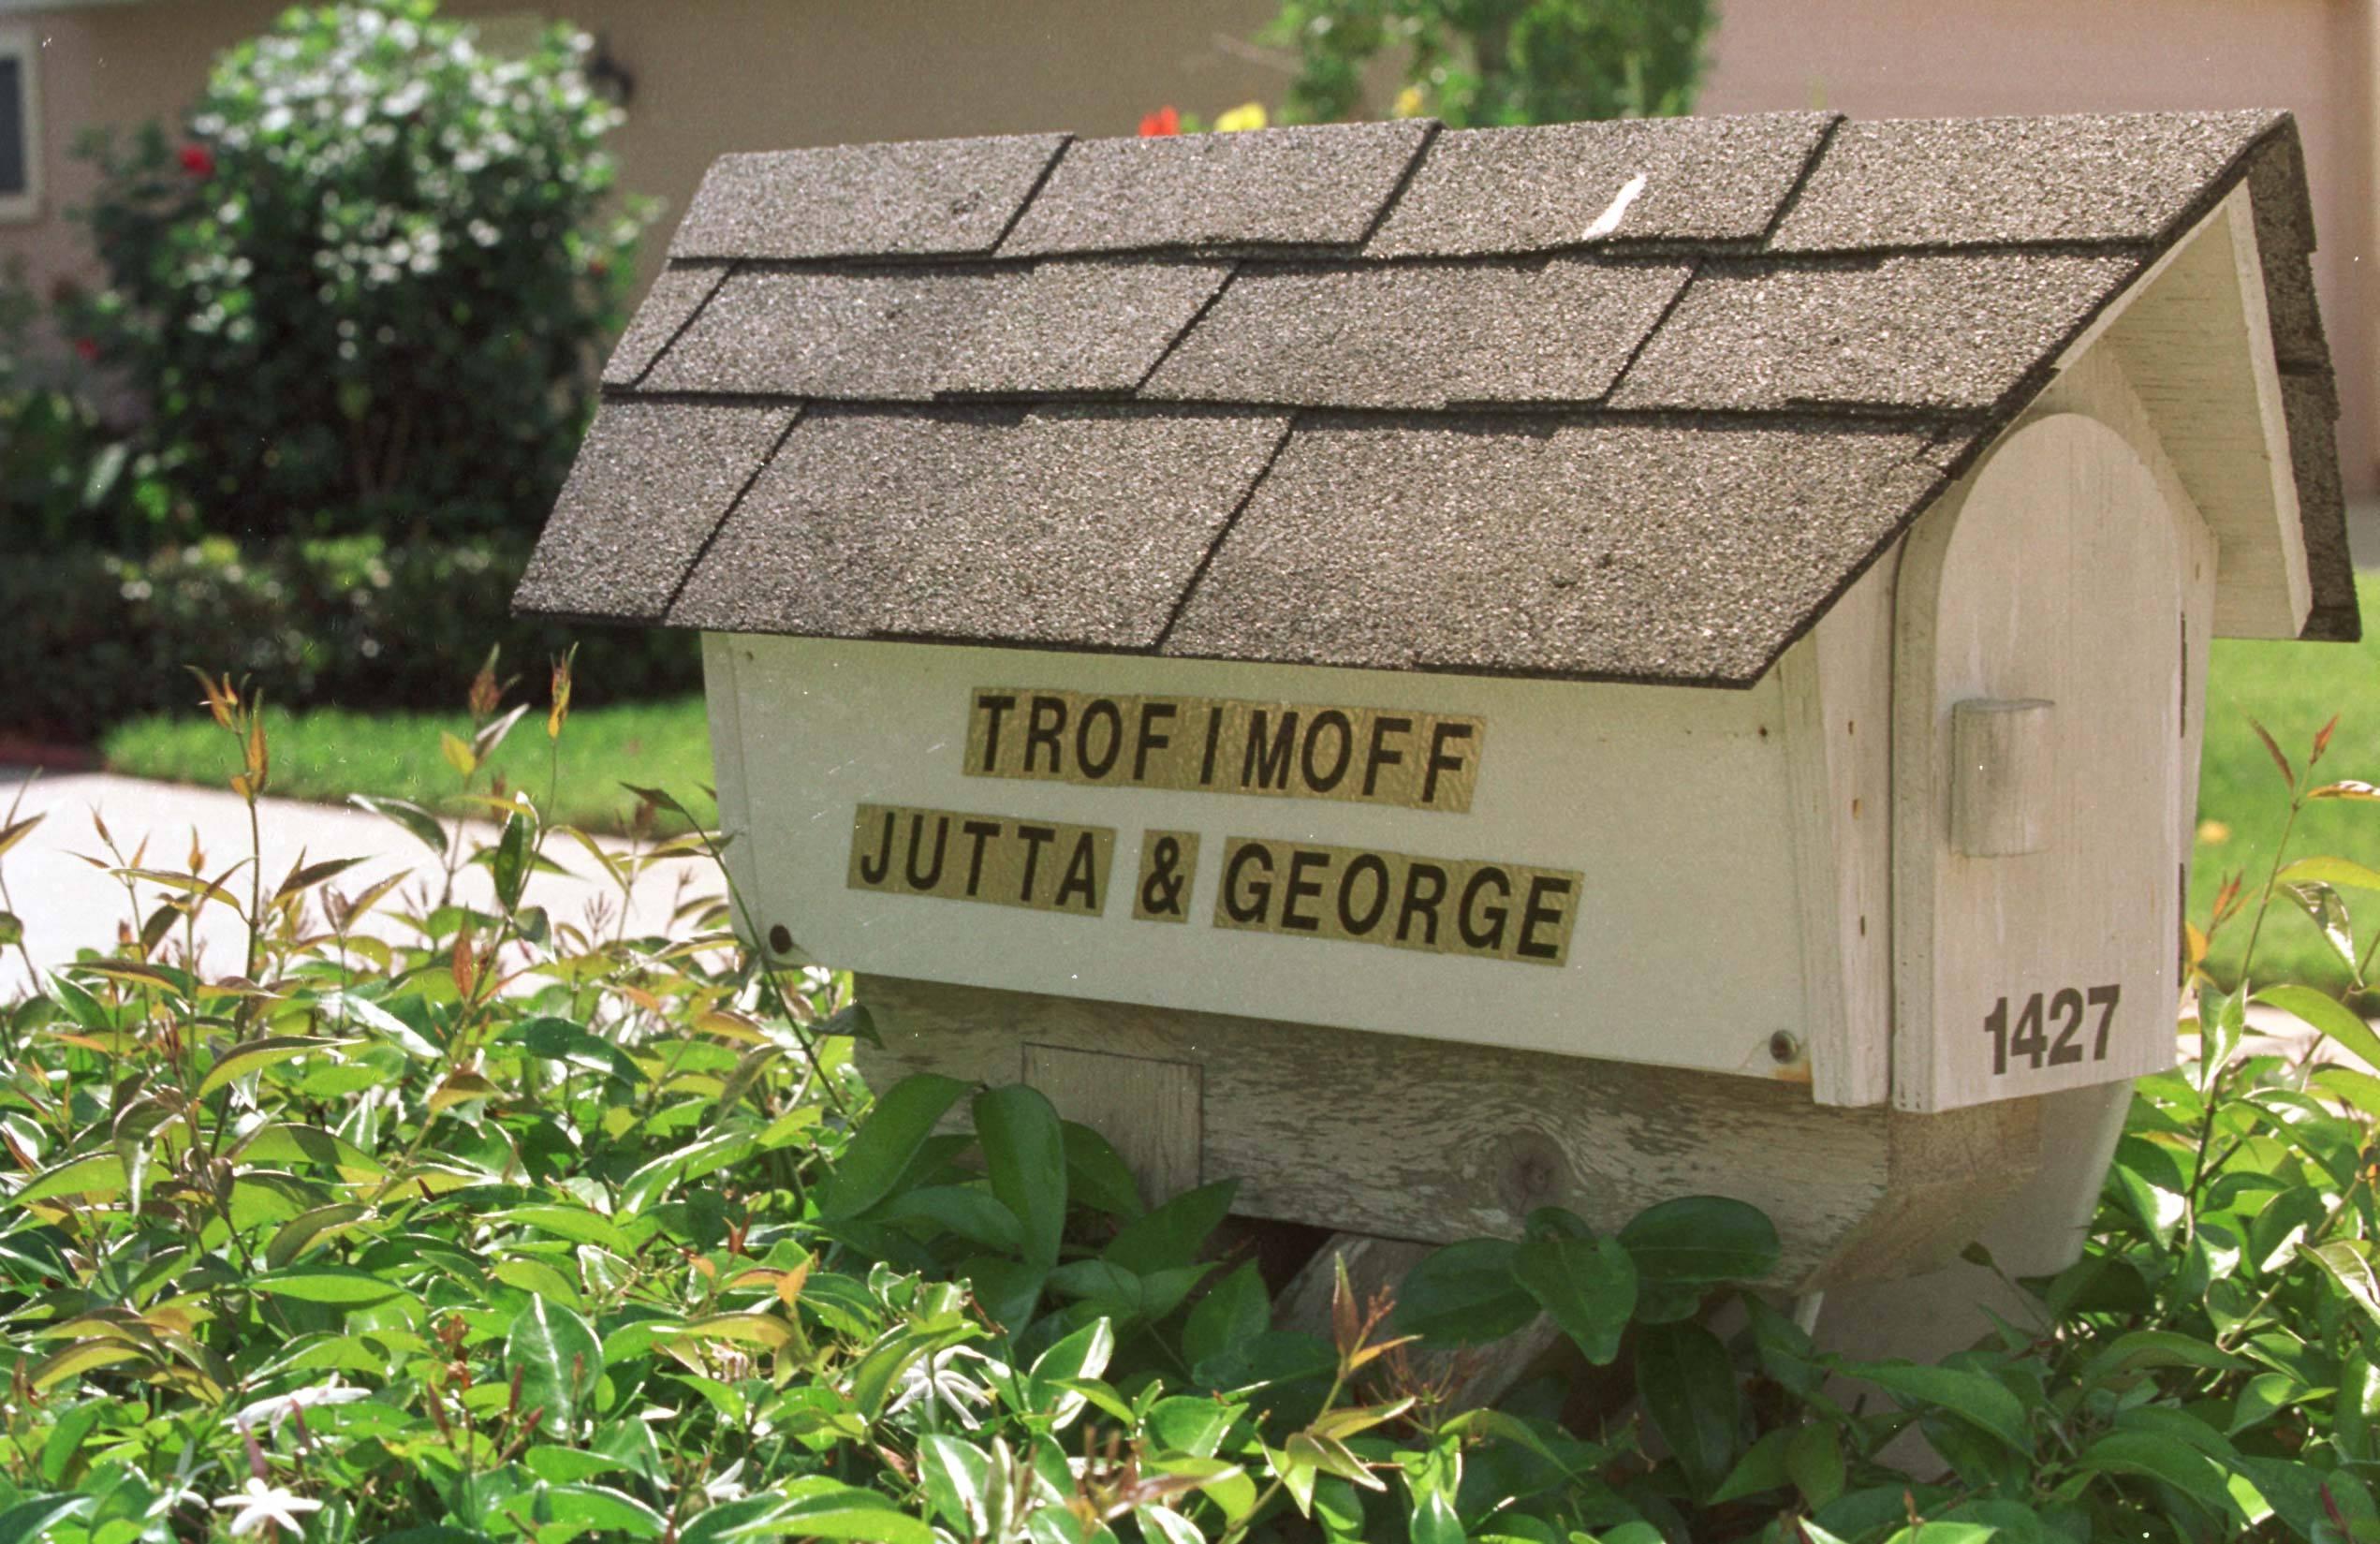 Home of accused Russian spy George Trofimoff